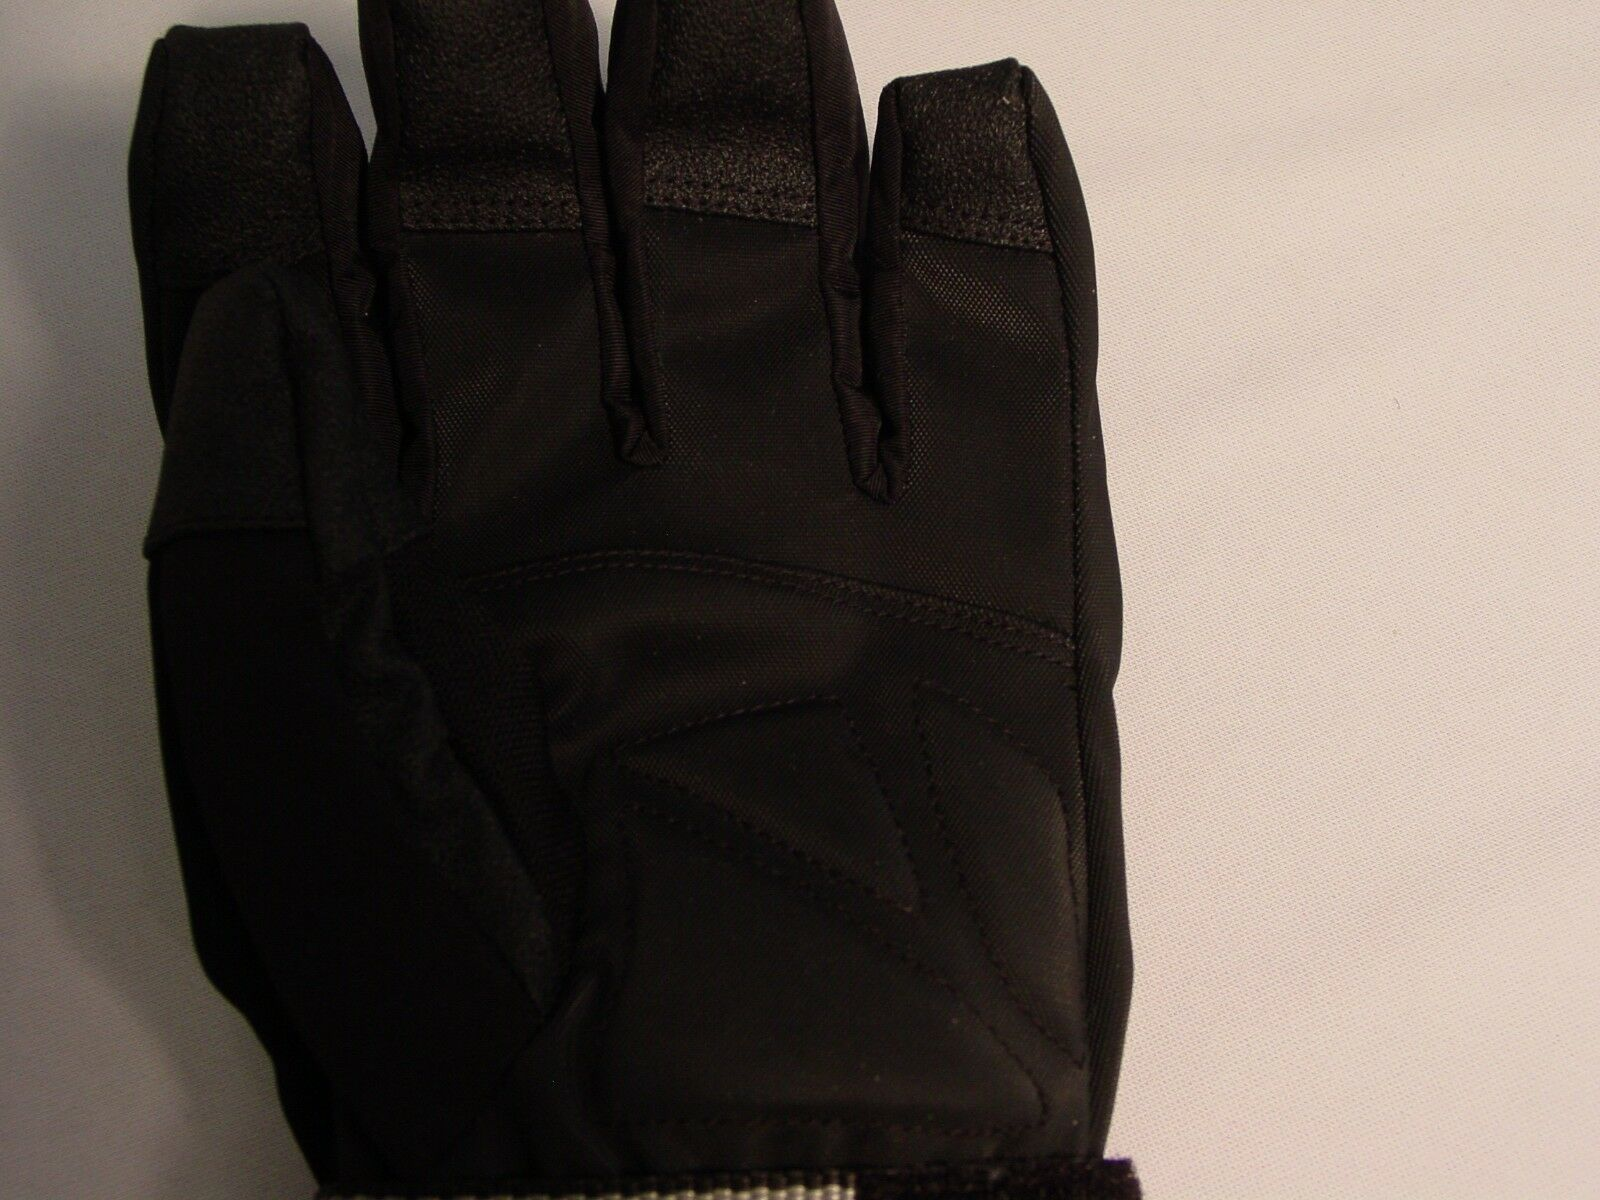 New Reusch Snow Board Gloves DOUBLE Wrist Protection RtexXT RtexXT RtexXT Medium 4204204S FLIP c6f7bd